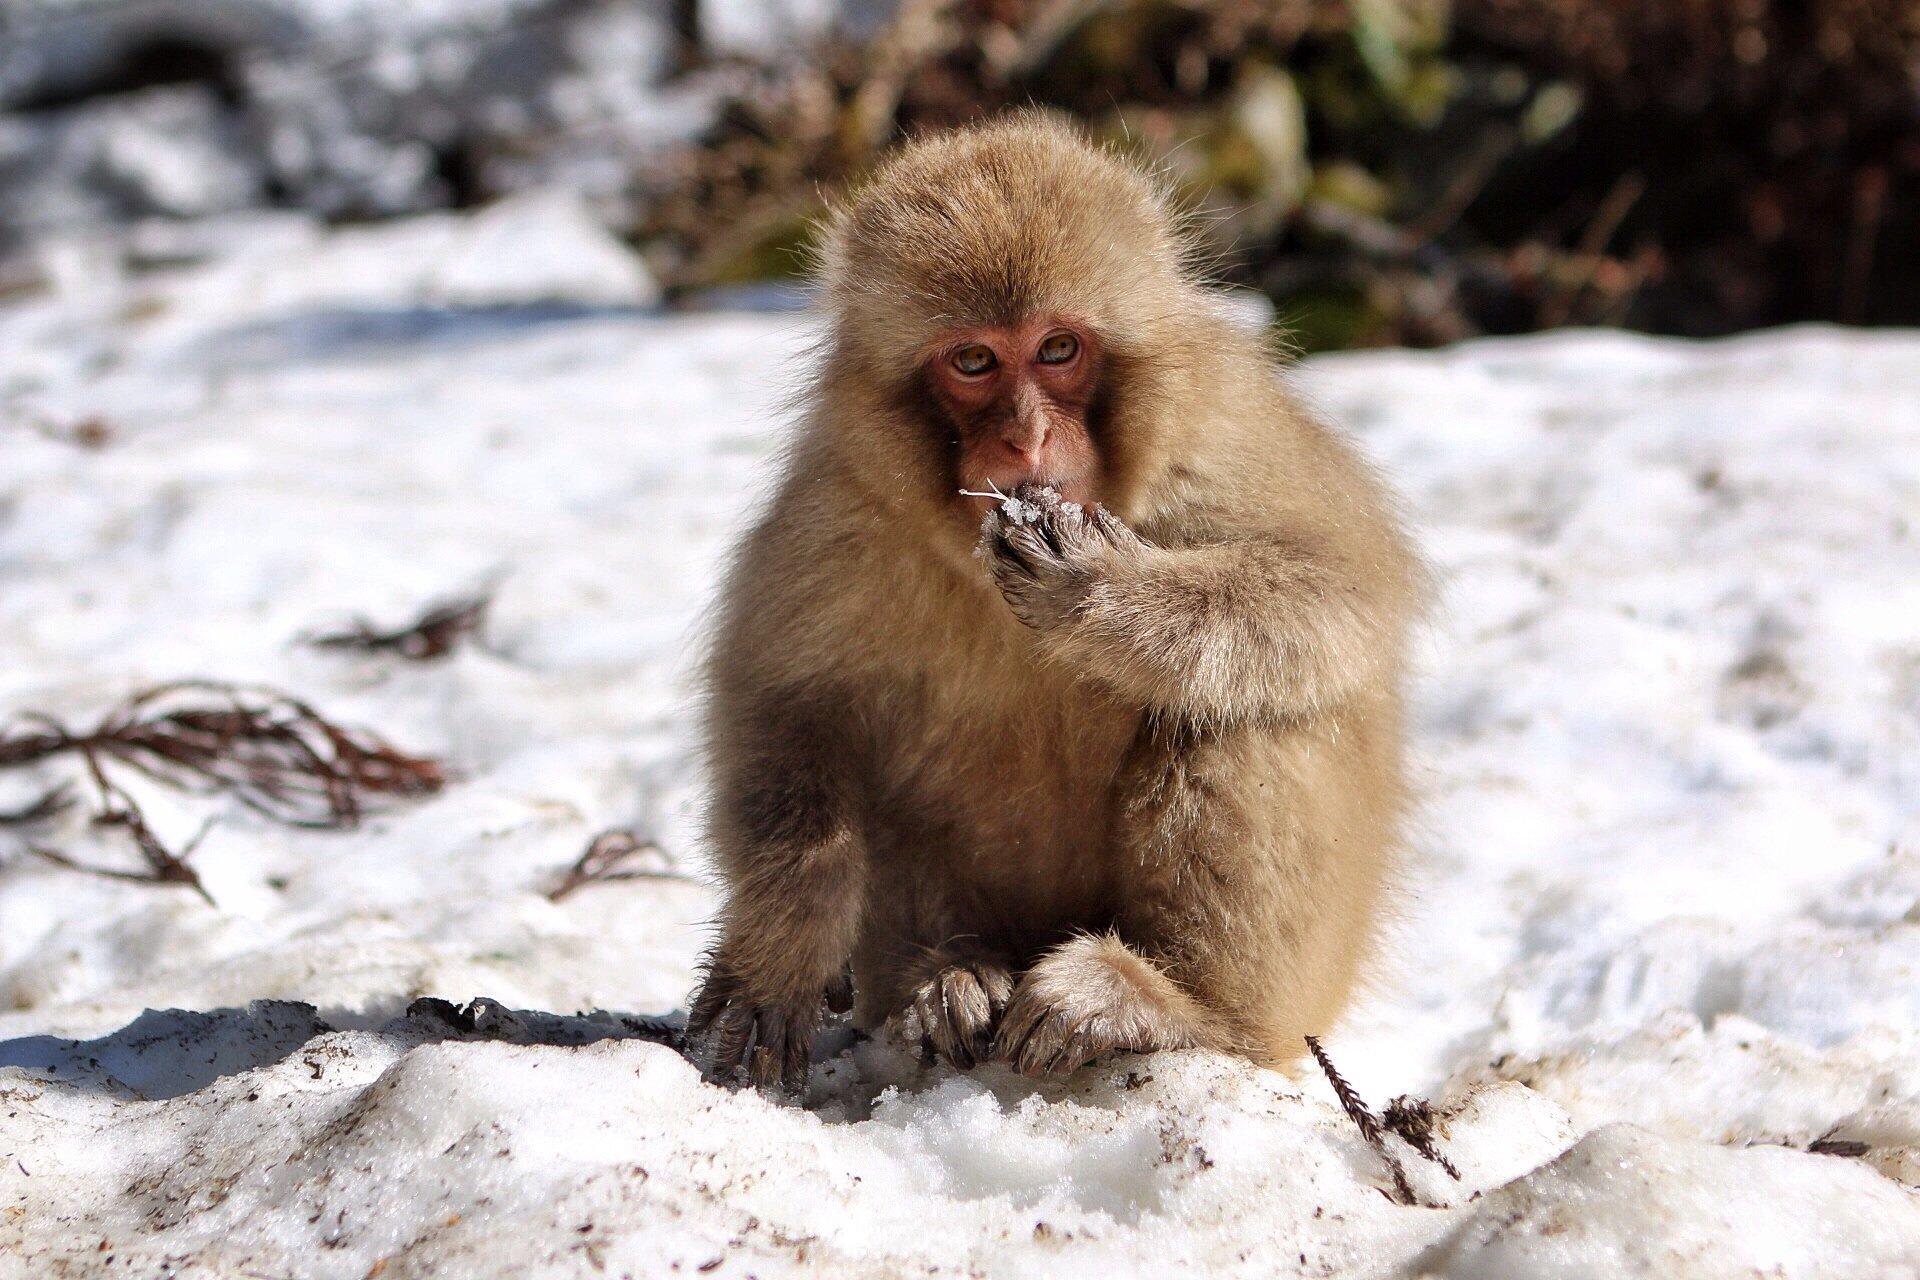 snow-monkeys-2-kasuma-photo-blog